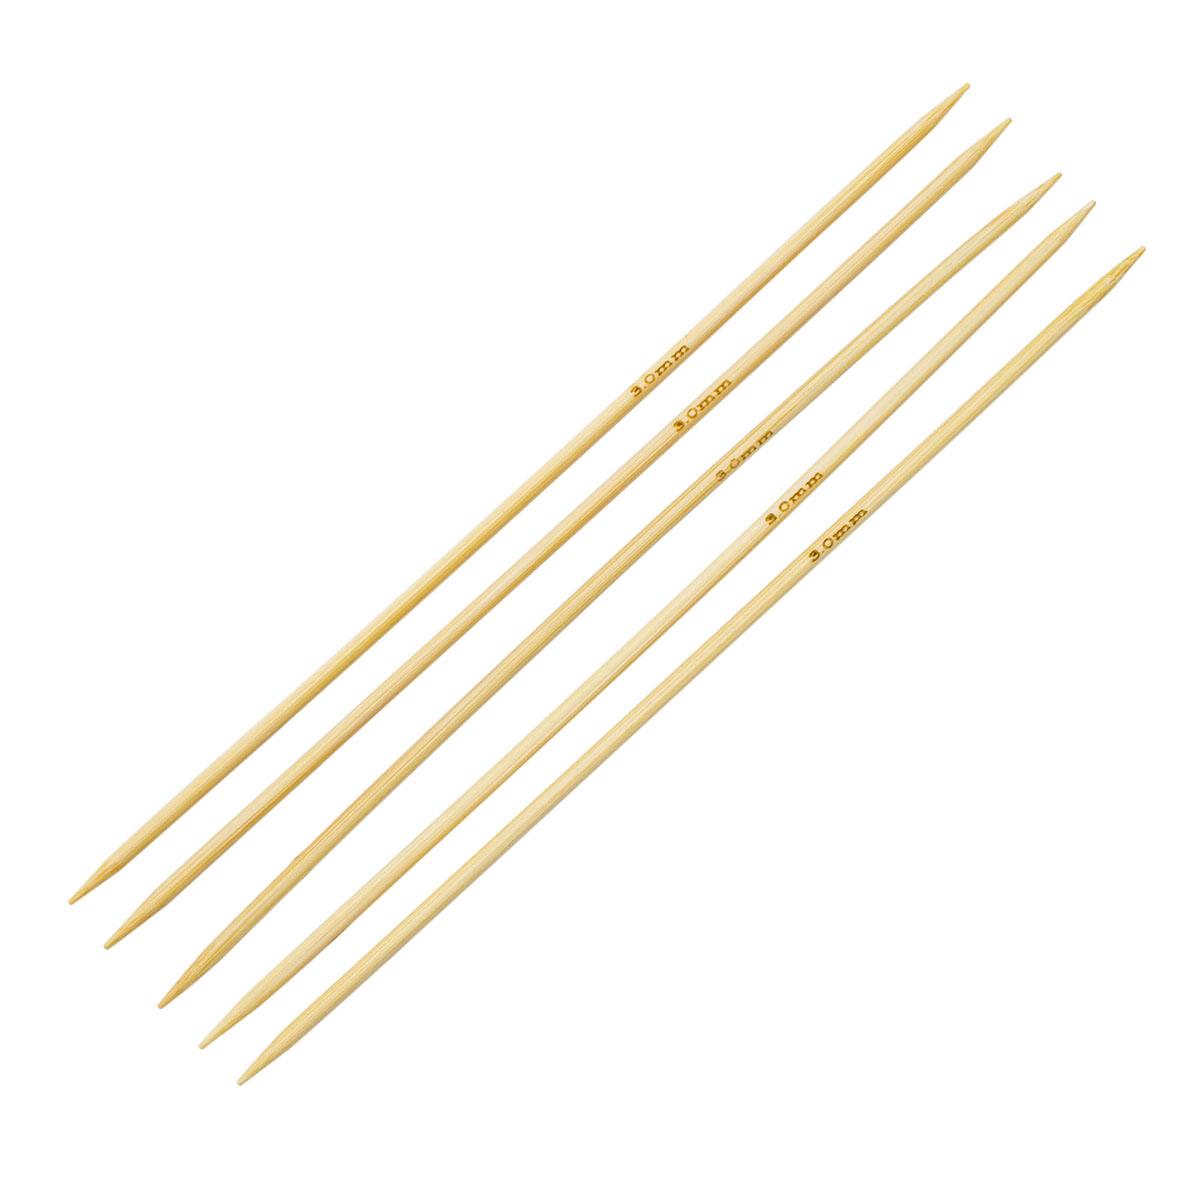 Спицы носочные бамбук 942530, 20 см, 3,0 мм, Hobby&Pro